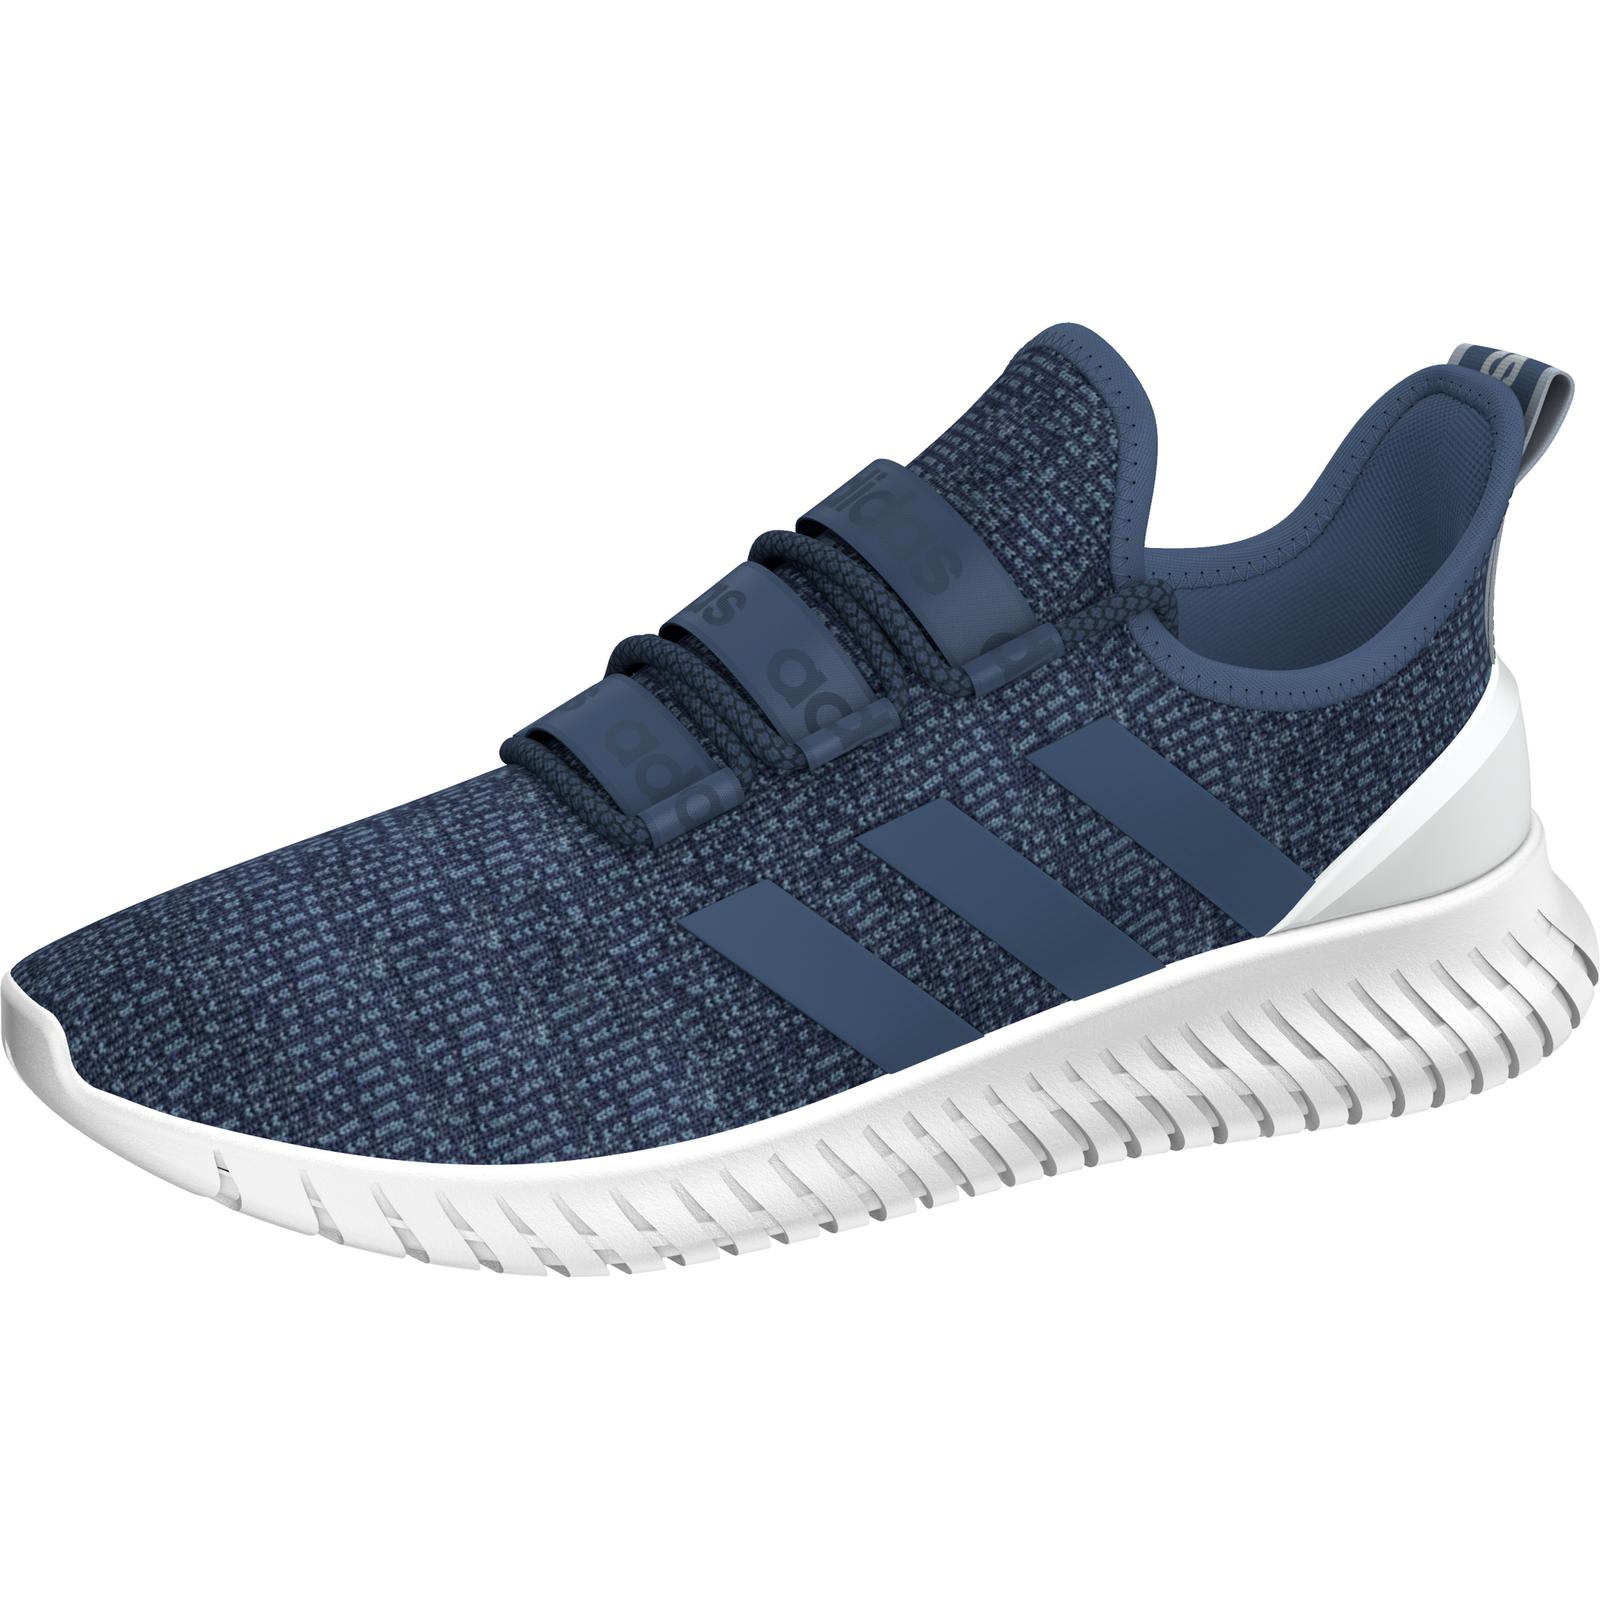 Adidas Perforhommece Pour des hommes Leisure Fitness paniers chaussures kaptir bleu EE9517